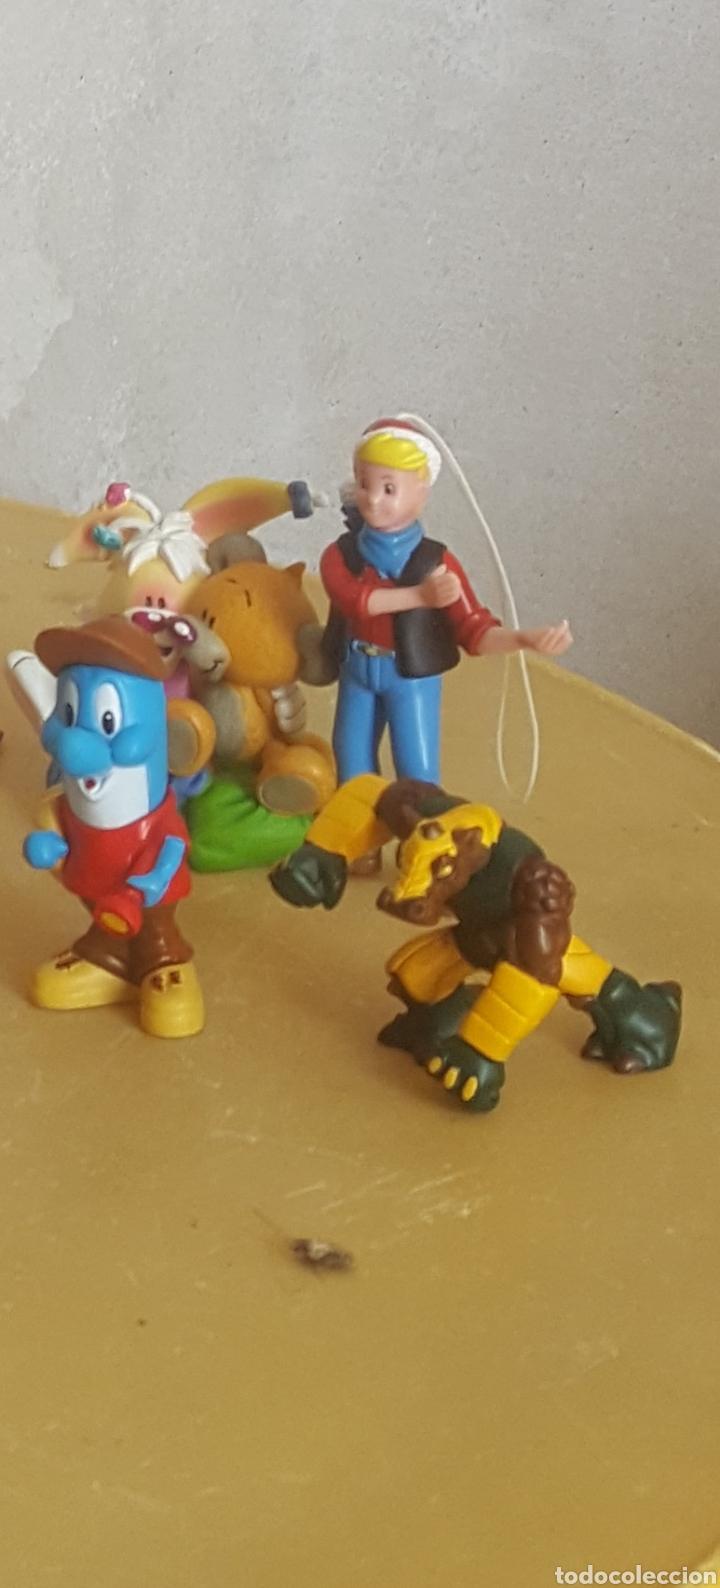 LOTE FIGURAS PVC GOMA MUÑECOS DISNEY (Juguetes - Figuras de Goma y Pvc - Otras)